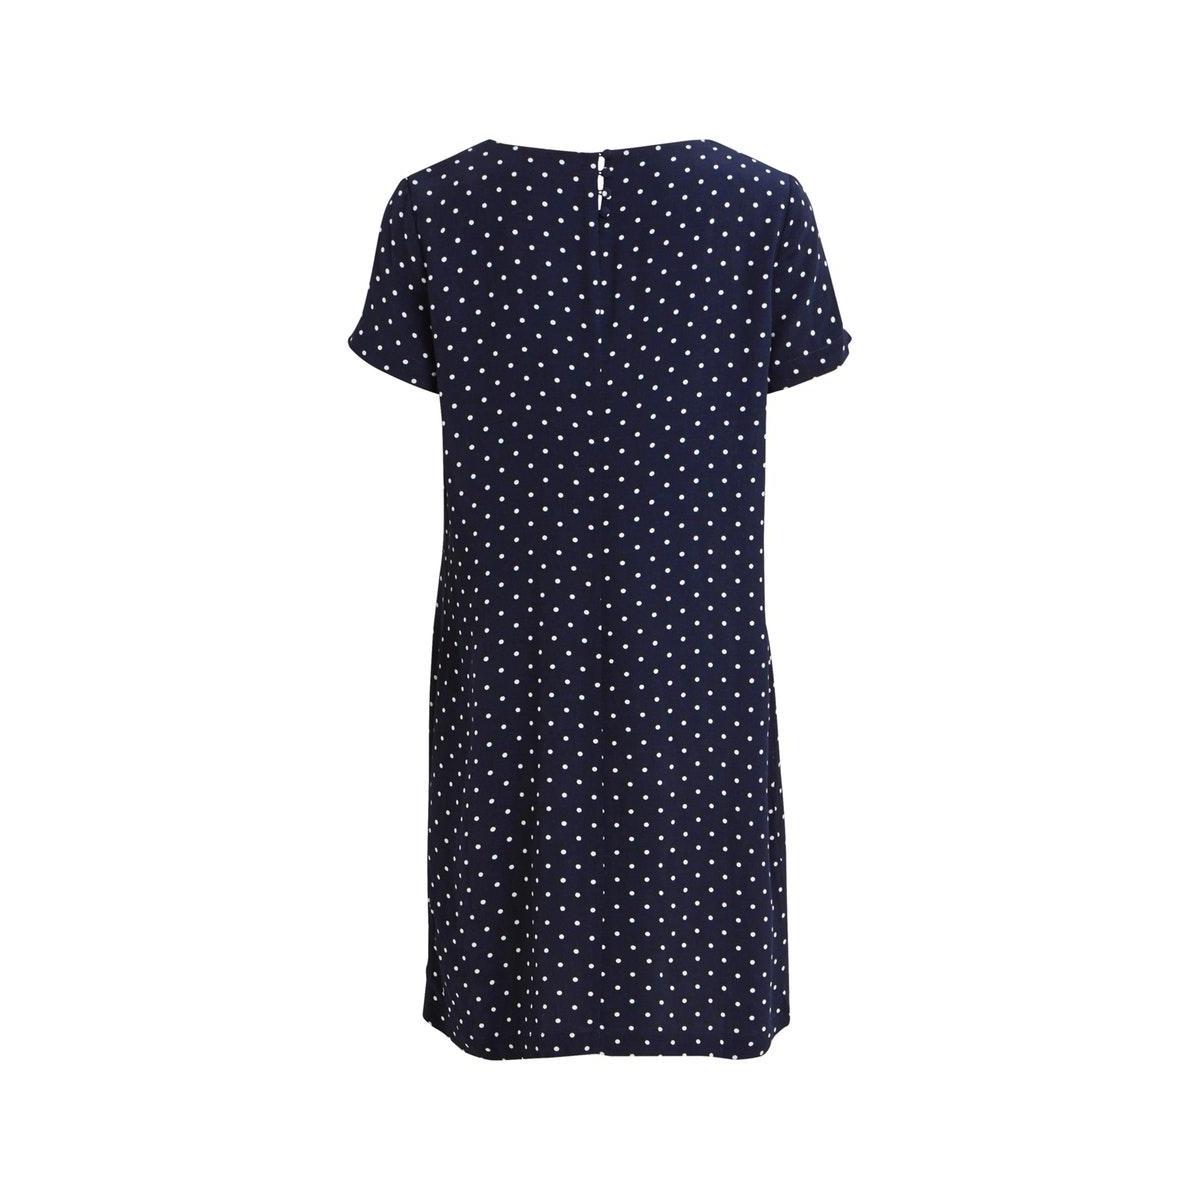 viprimera s/s dress-fav lux 14055566 vila jurk navy blazer/snow white